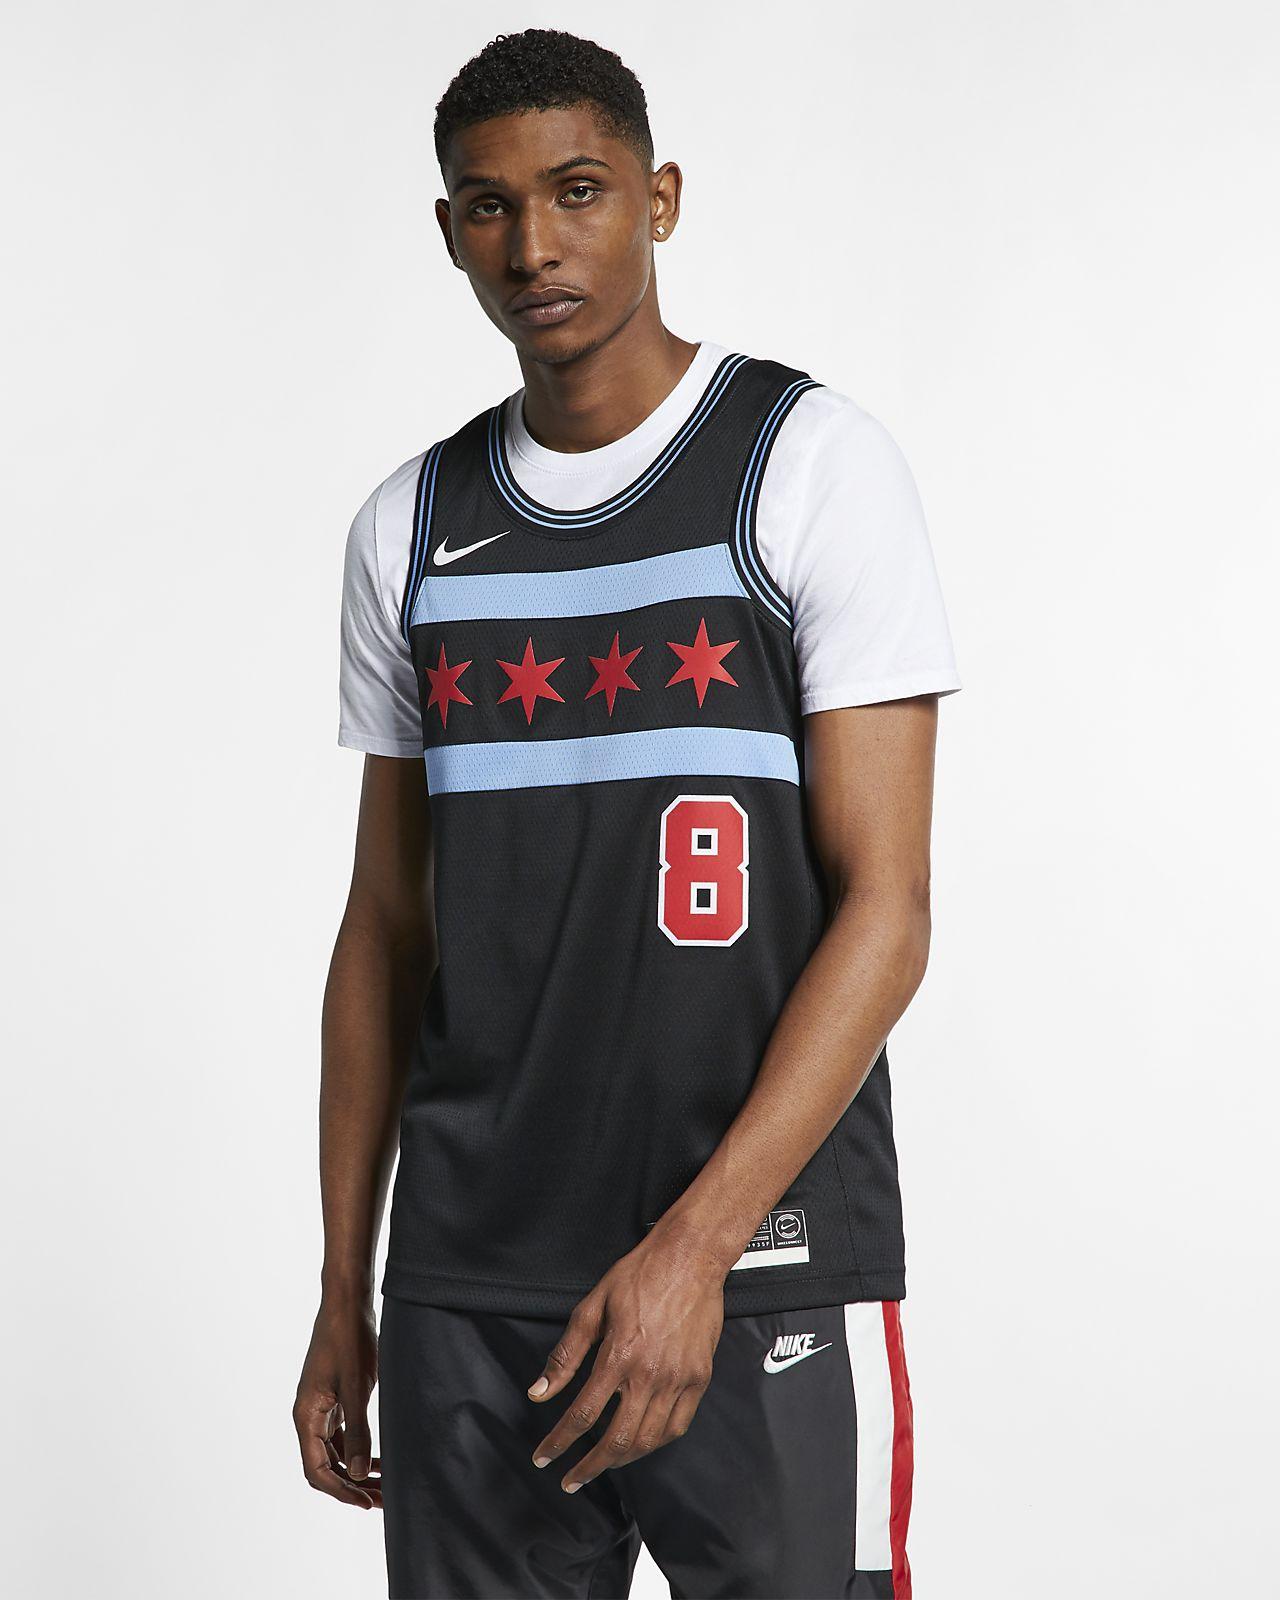 Zach LaVine City Edition Swingman (Chicago Bulls)-Nike NBA Connected-trøje til mænd